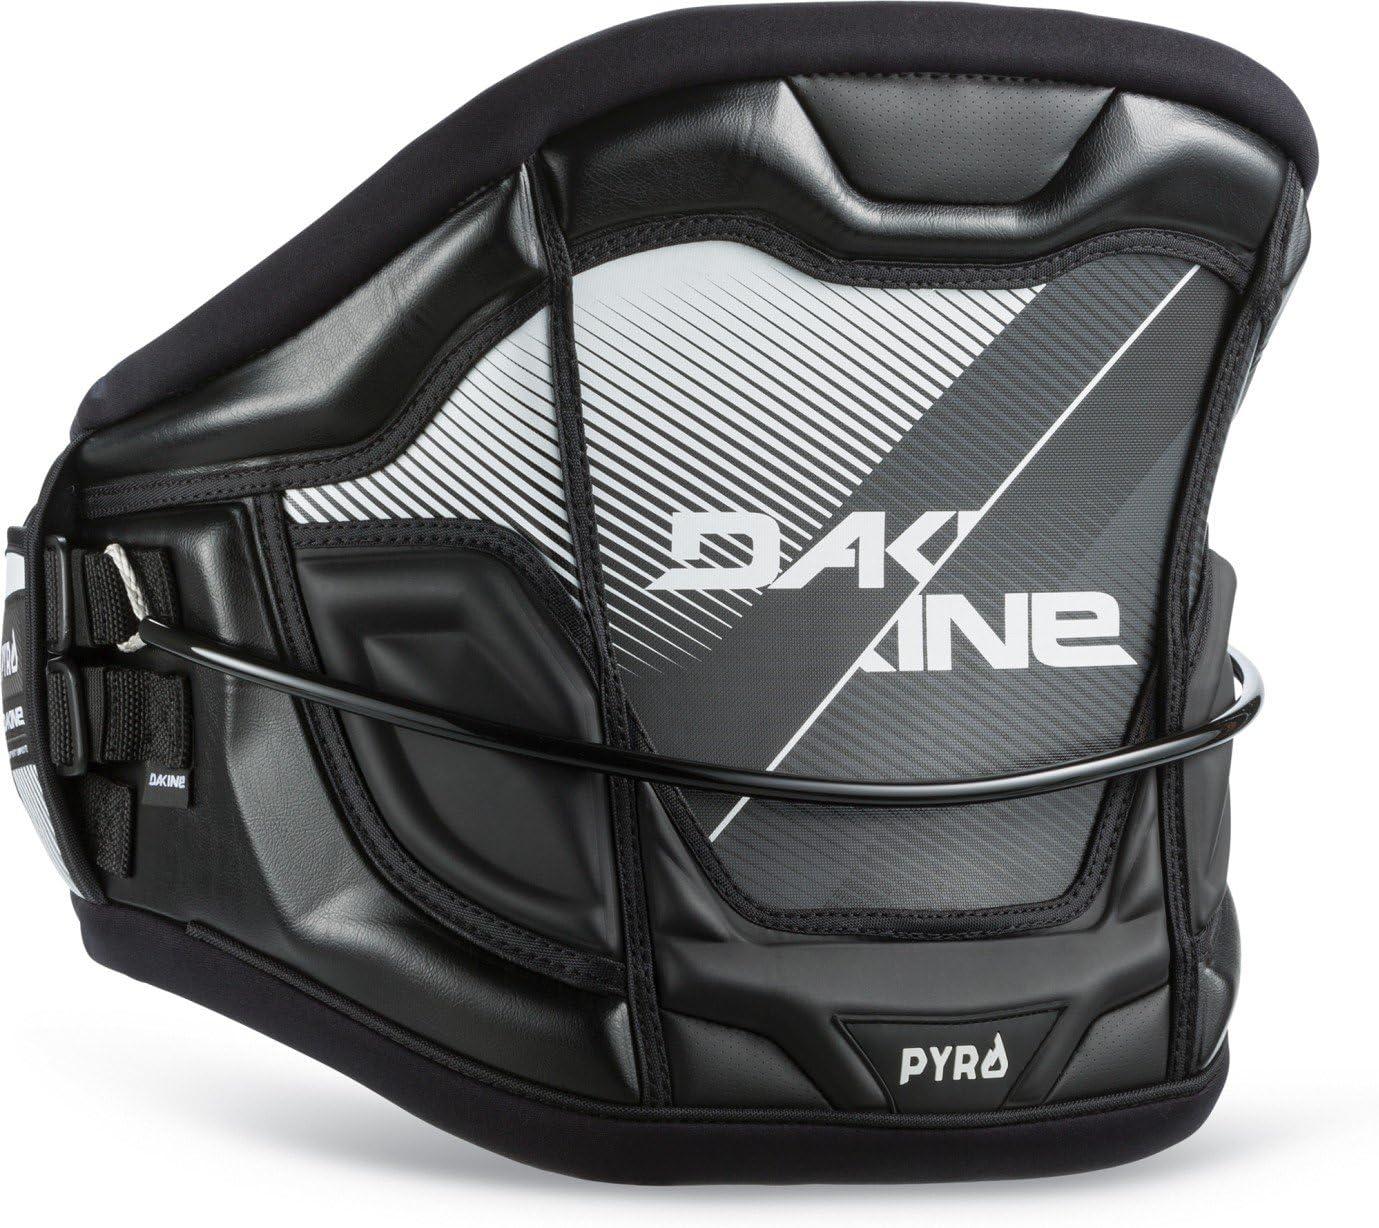 Dakine Men's Pyro Kiteboard XS Easy-to-use Black Now on sale Harness